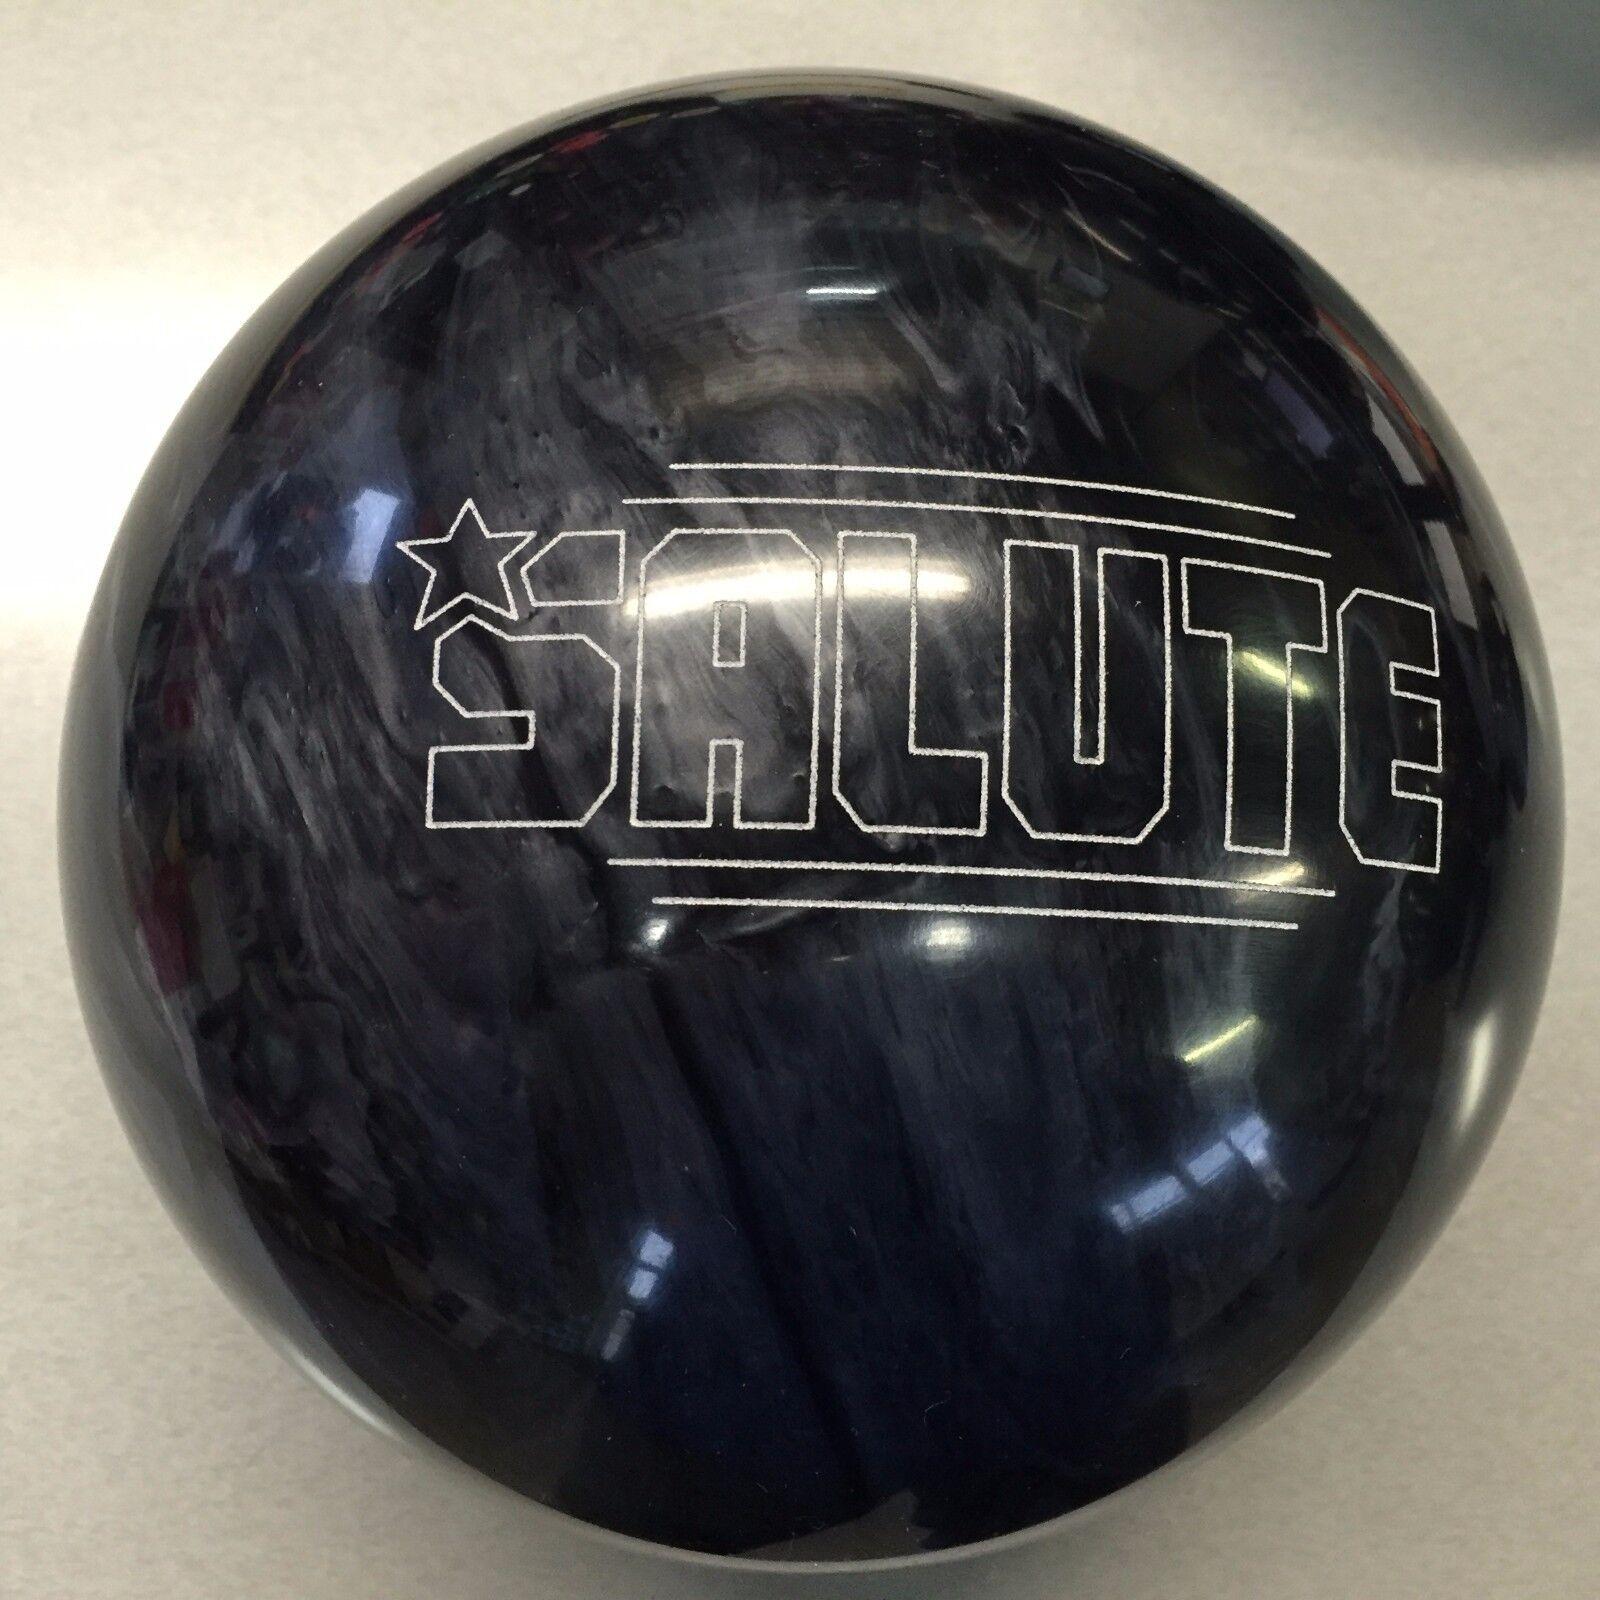 Ebonite SALUTE  1ST QUALITY  BOWLING  ball  16 lb.   BRAND NEW IN BOX